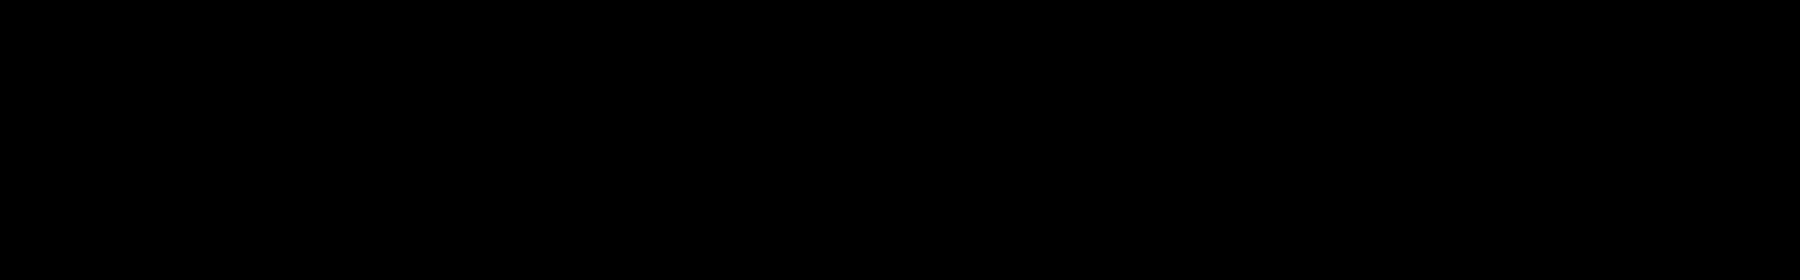 Juice Bundle audio waveform